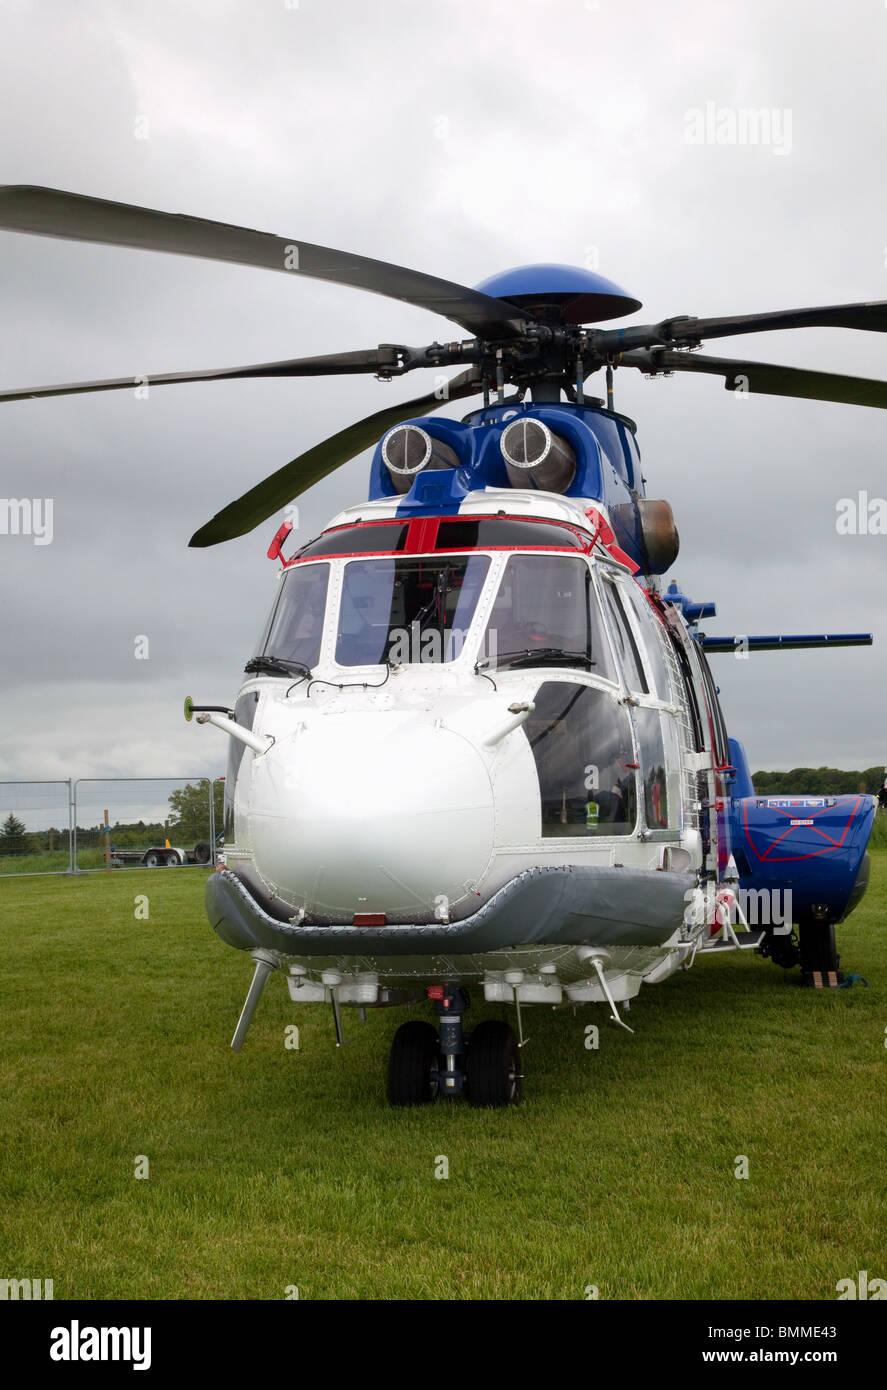 EC 225 Helicopter, Super Puma Mk II,  Bristow Aircraft, Aberdeenshire, Scotland, UK - Stock Image